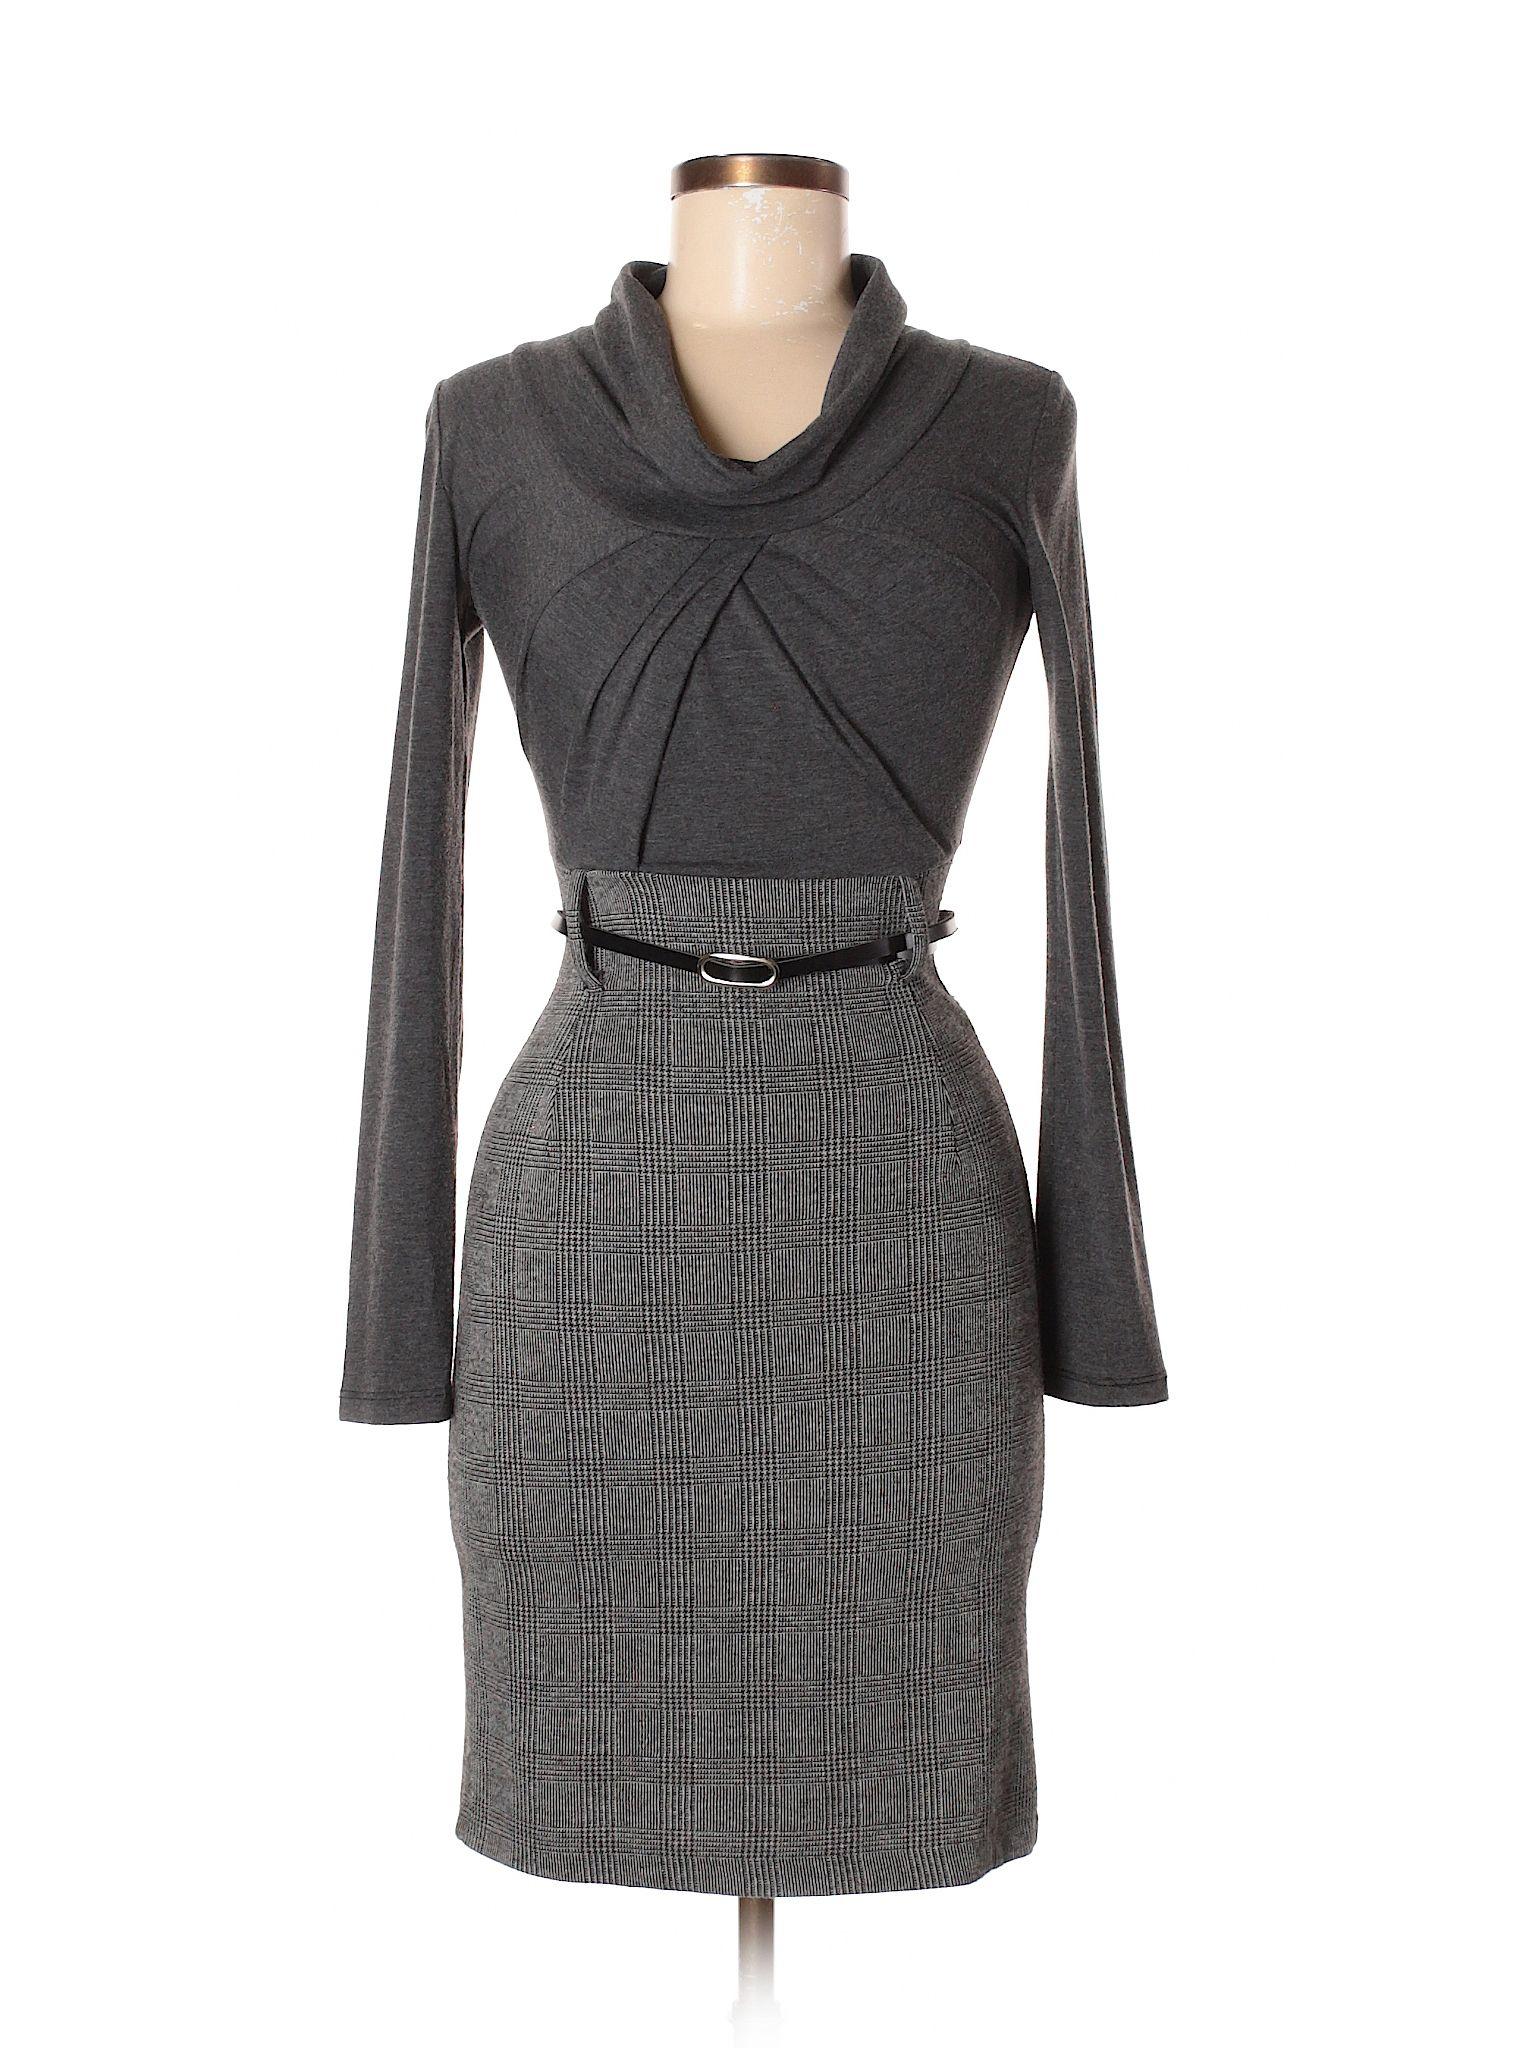 Rinascimento Plaid Color Block Gray Casual Dress Size Xs 84 Off Casual Dress Casual Dresses [ 2048 x 1536 Pixel ]